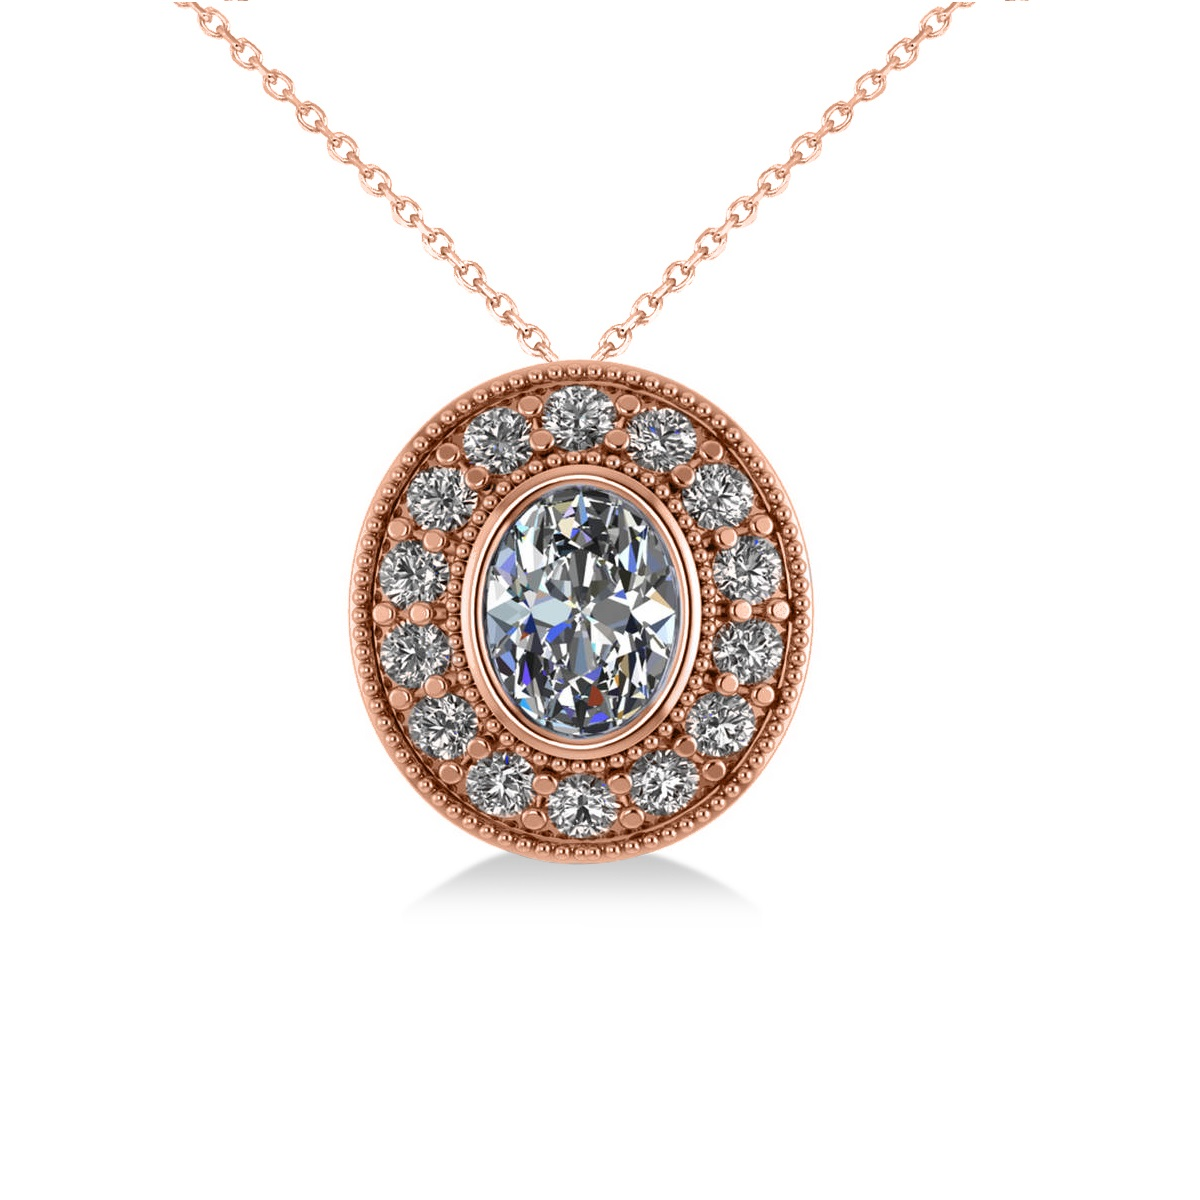 Diamond Halo Oval Pendant Necklace 14k Rose Gold (1.18ct)